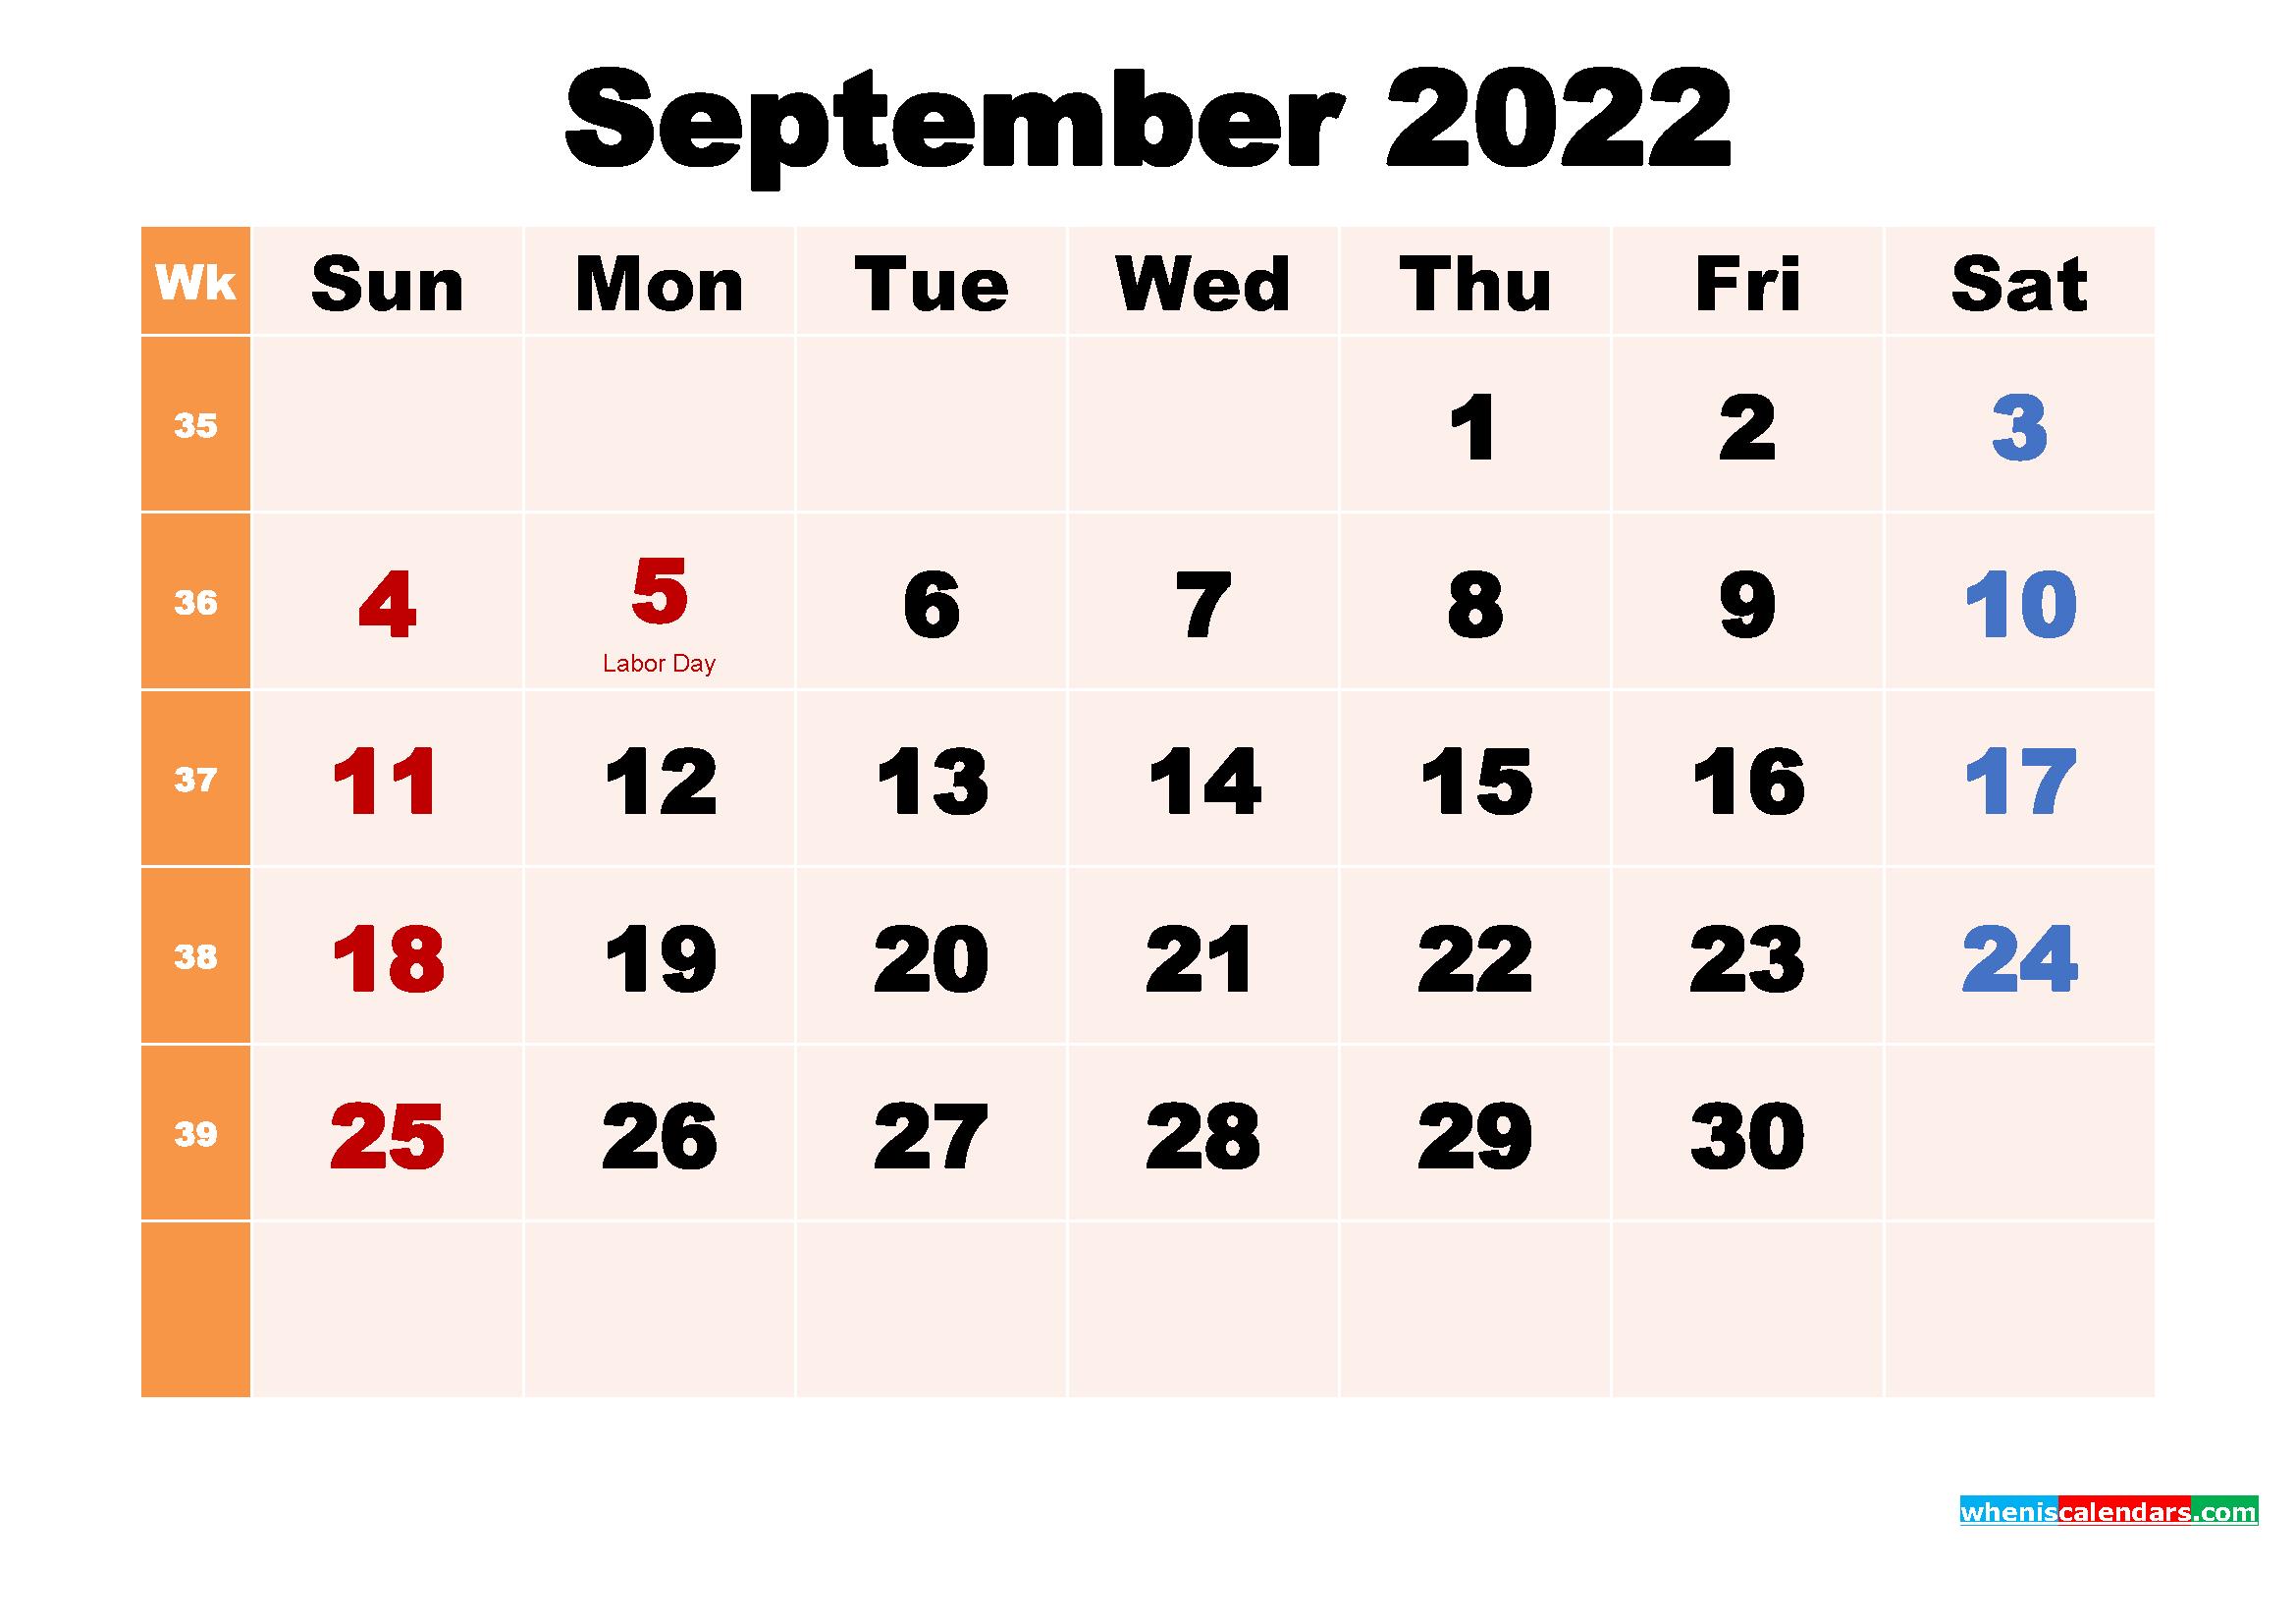 September 2022 Desktop Calendar with Holidays